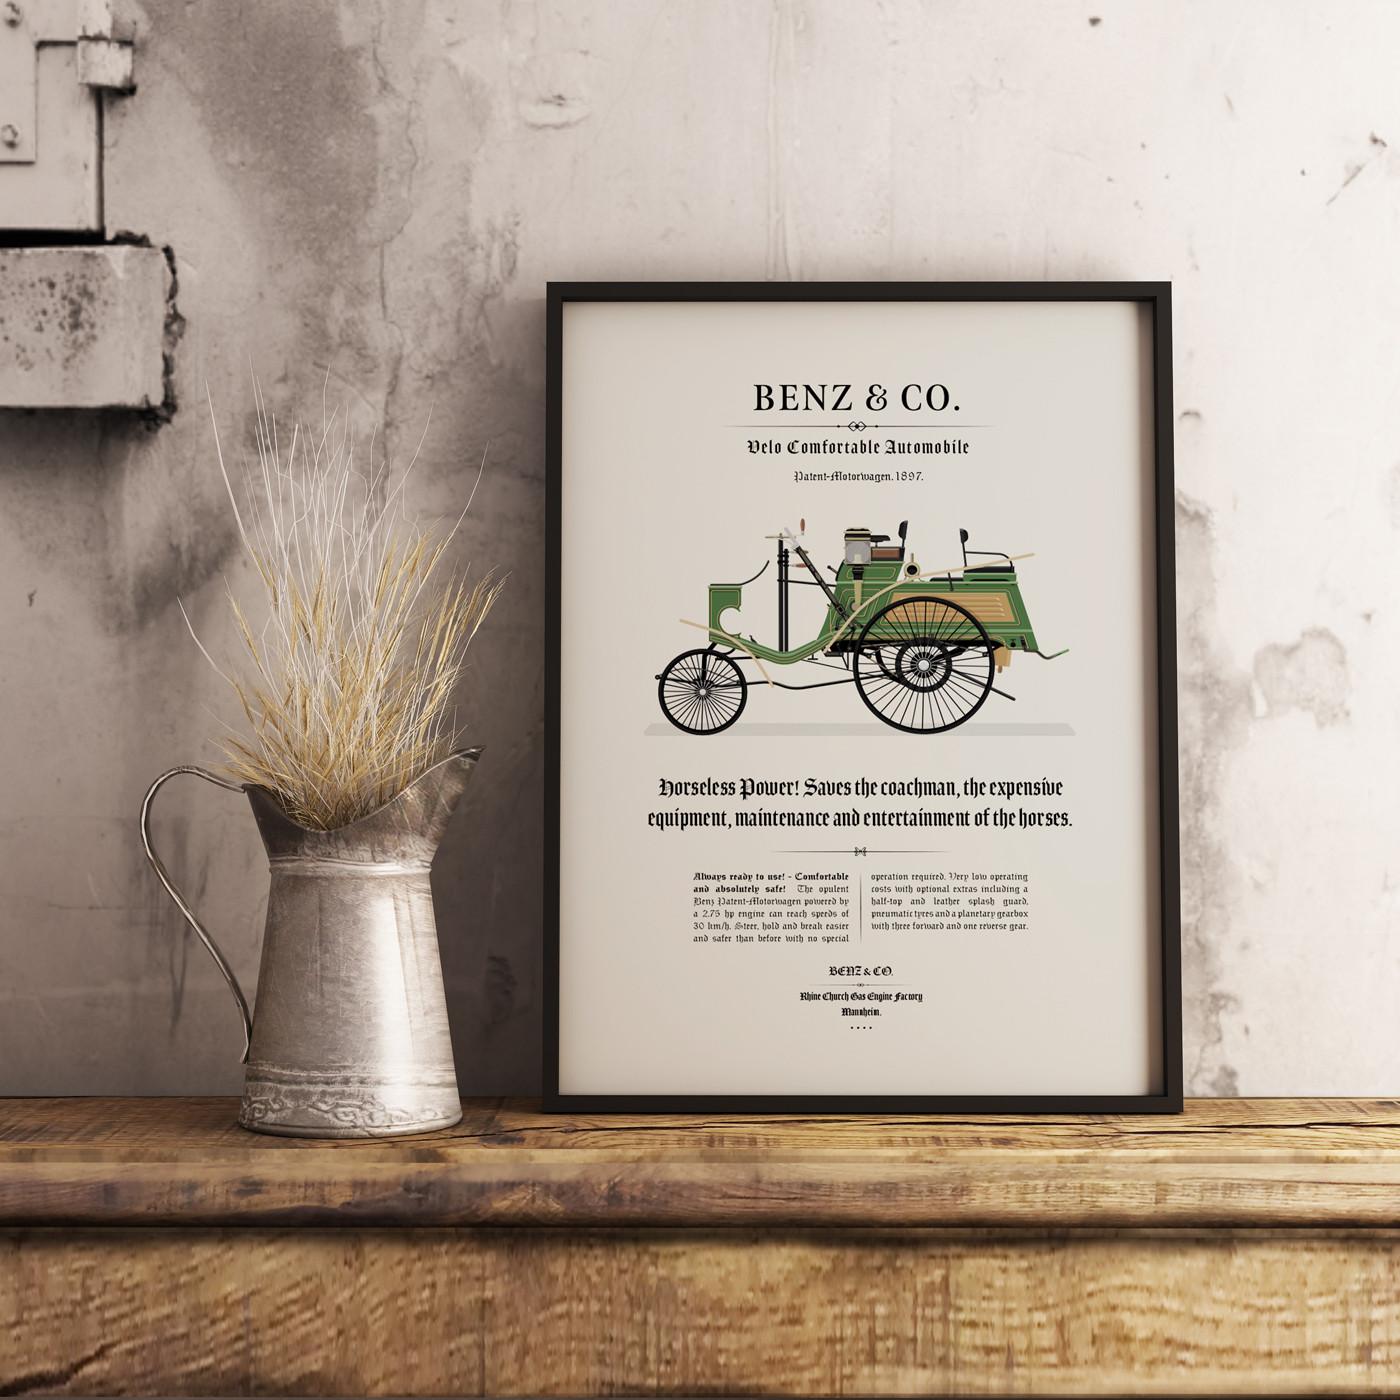 Framed 1897 Benz - Velo Comfortable